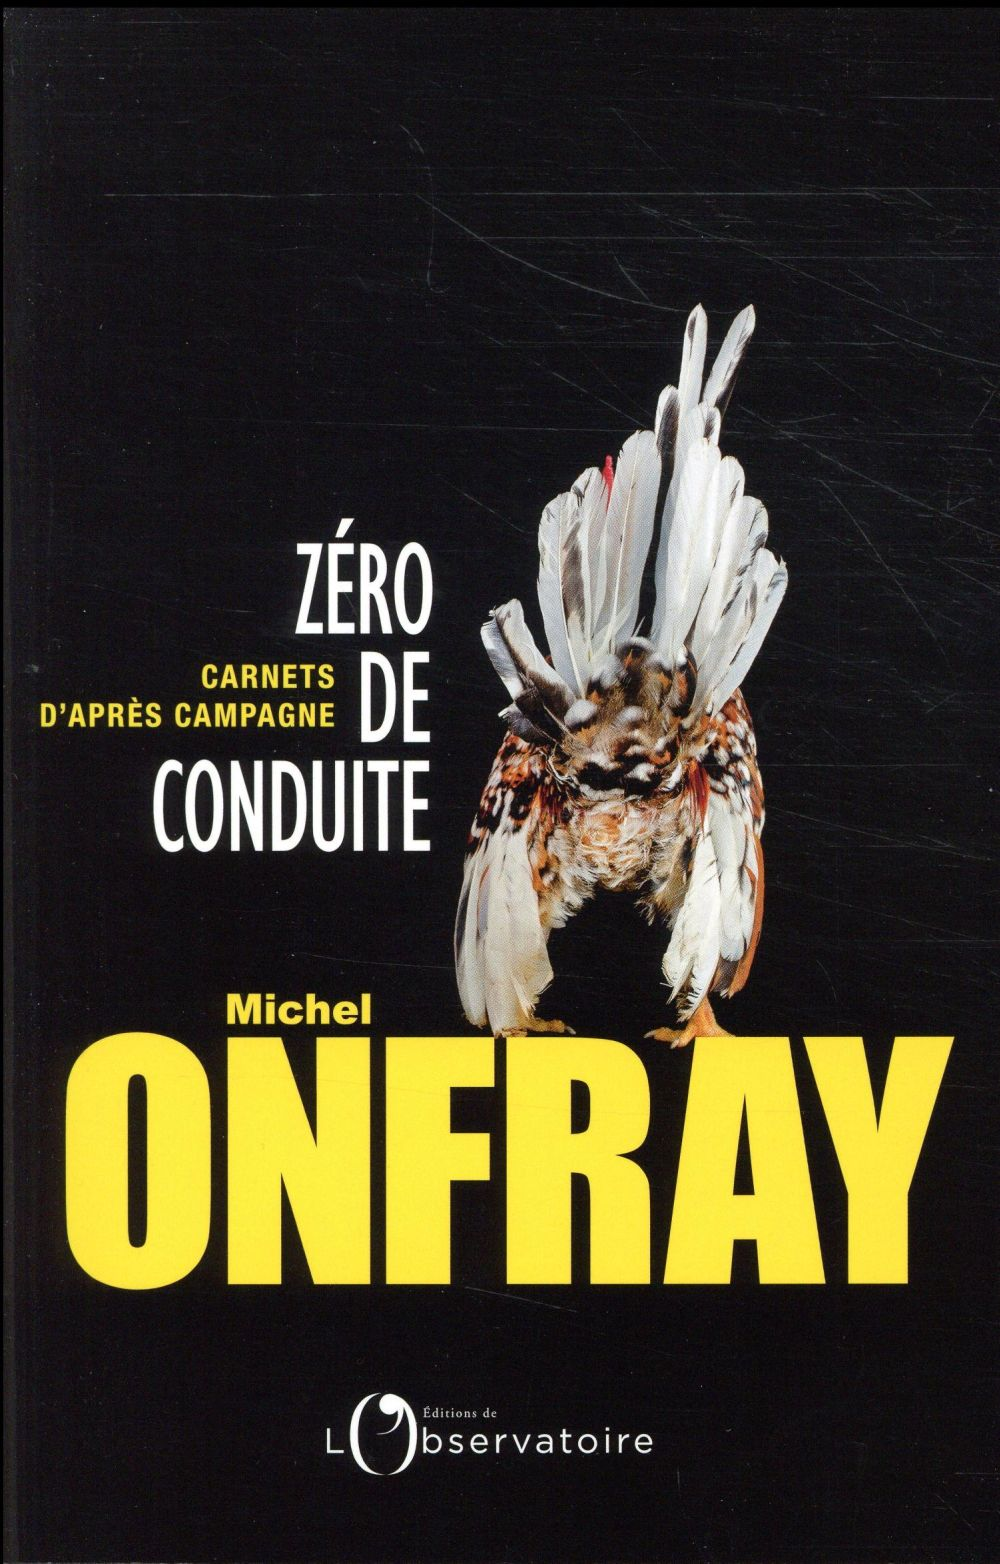 ZERO DE CONDUITE MICHEL ONFRAY L'OBSERVATOIRE